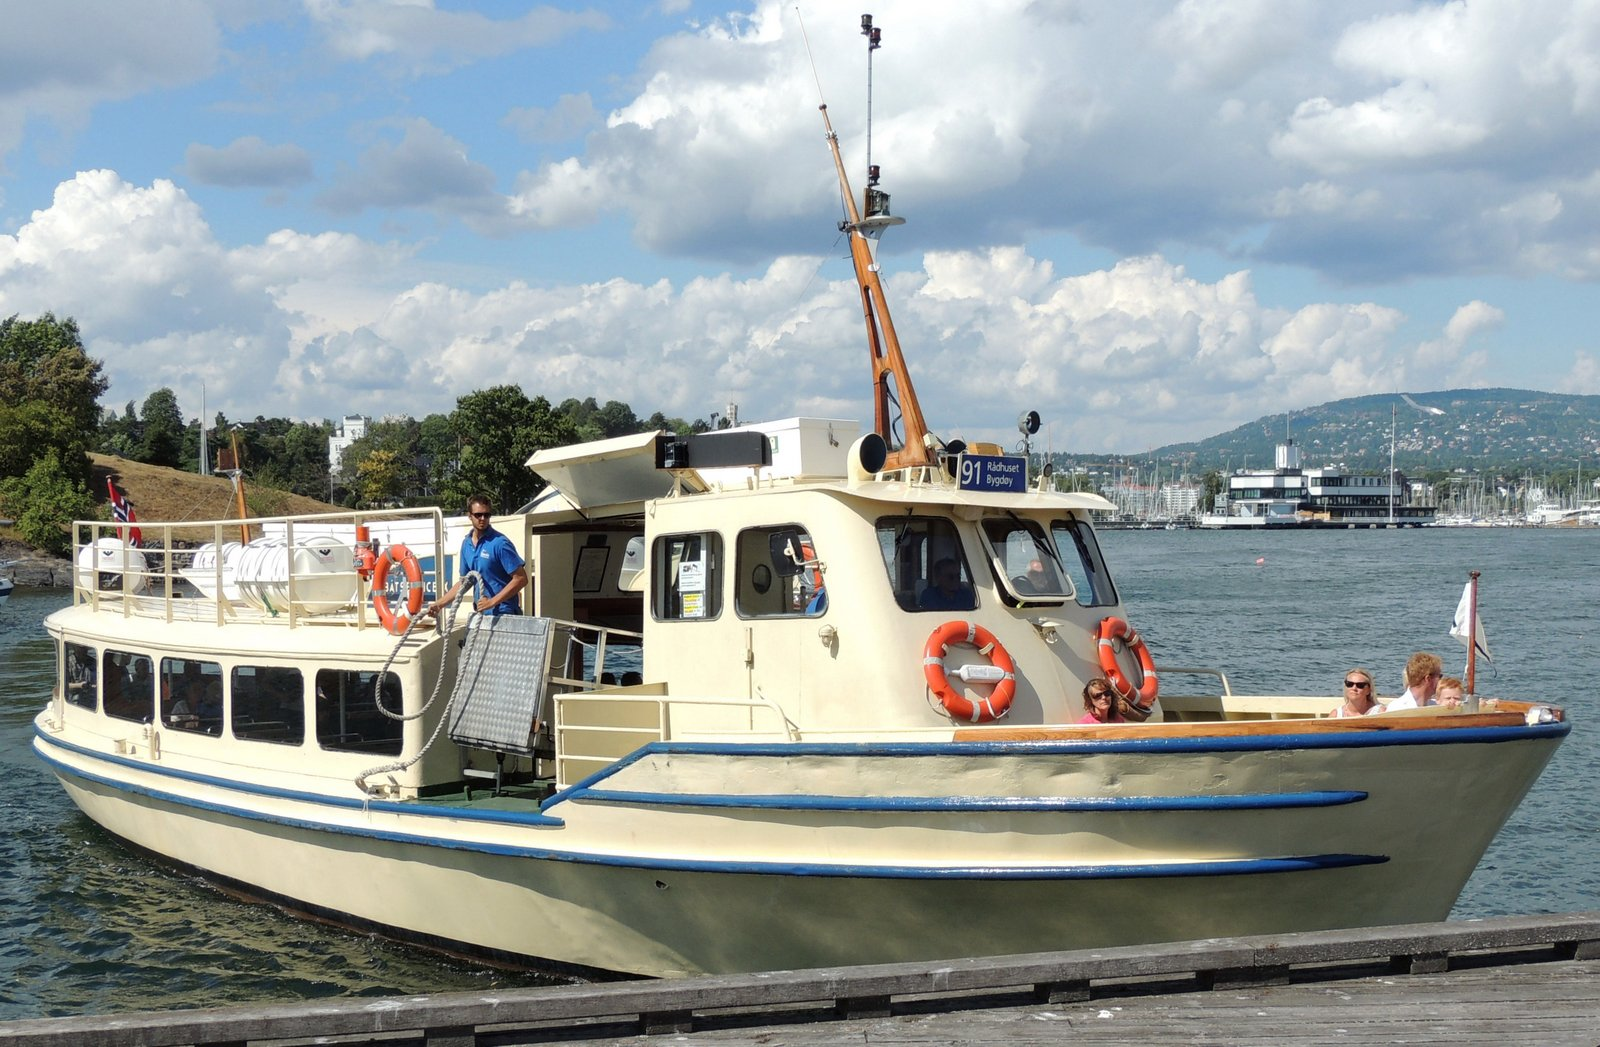 Linienboot Rathauskai - Bygdøy